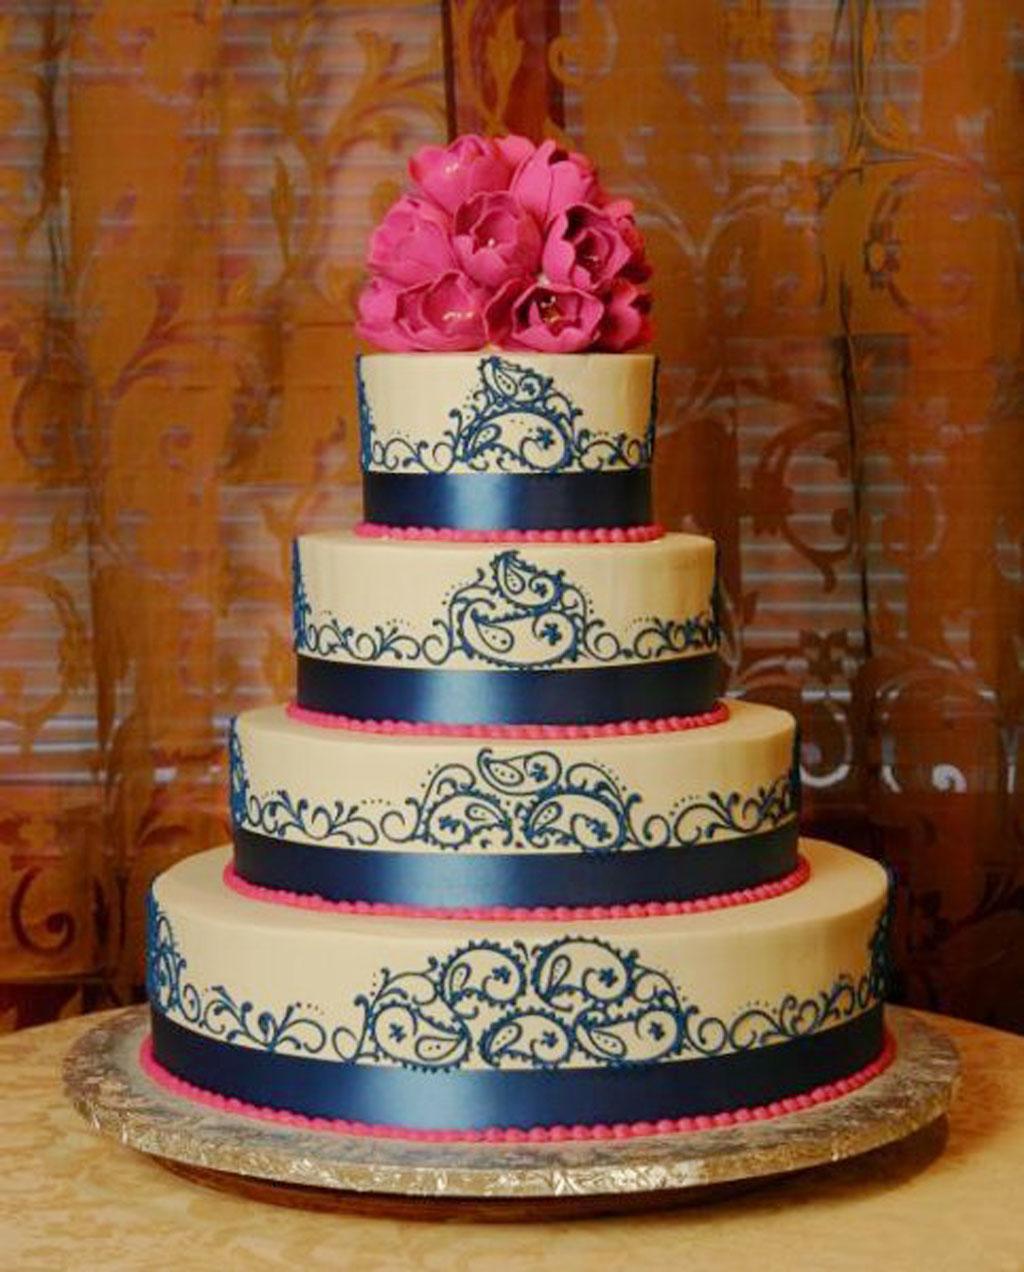 konditor meister wedding cake design picture in wedding cake - Wedding Cake Design Ideas